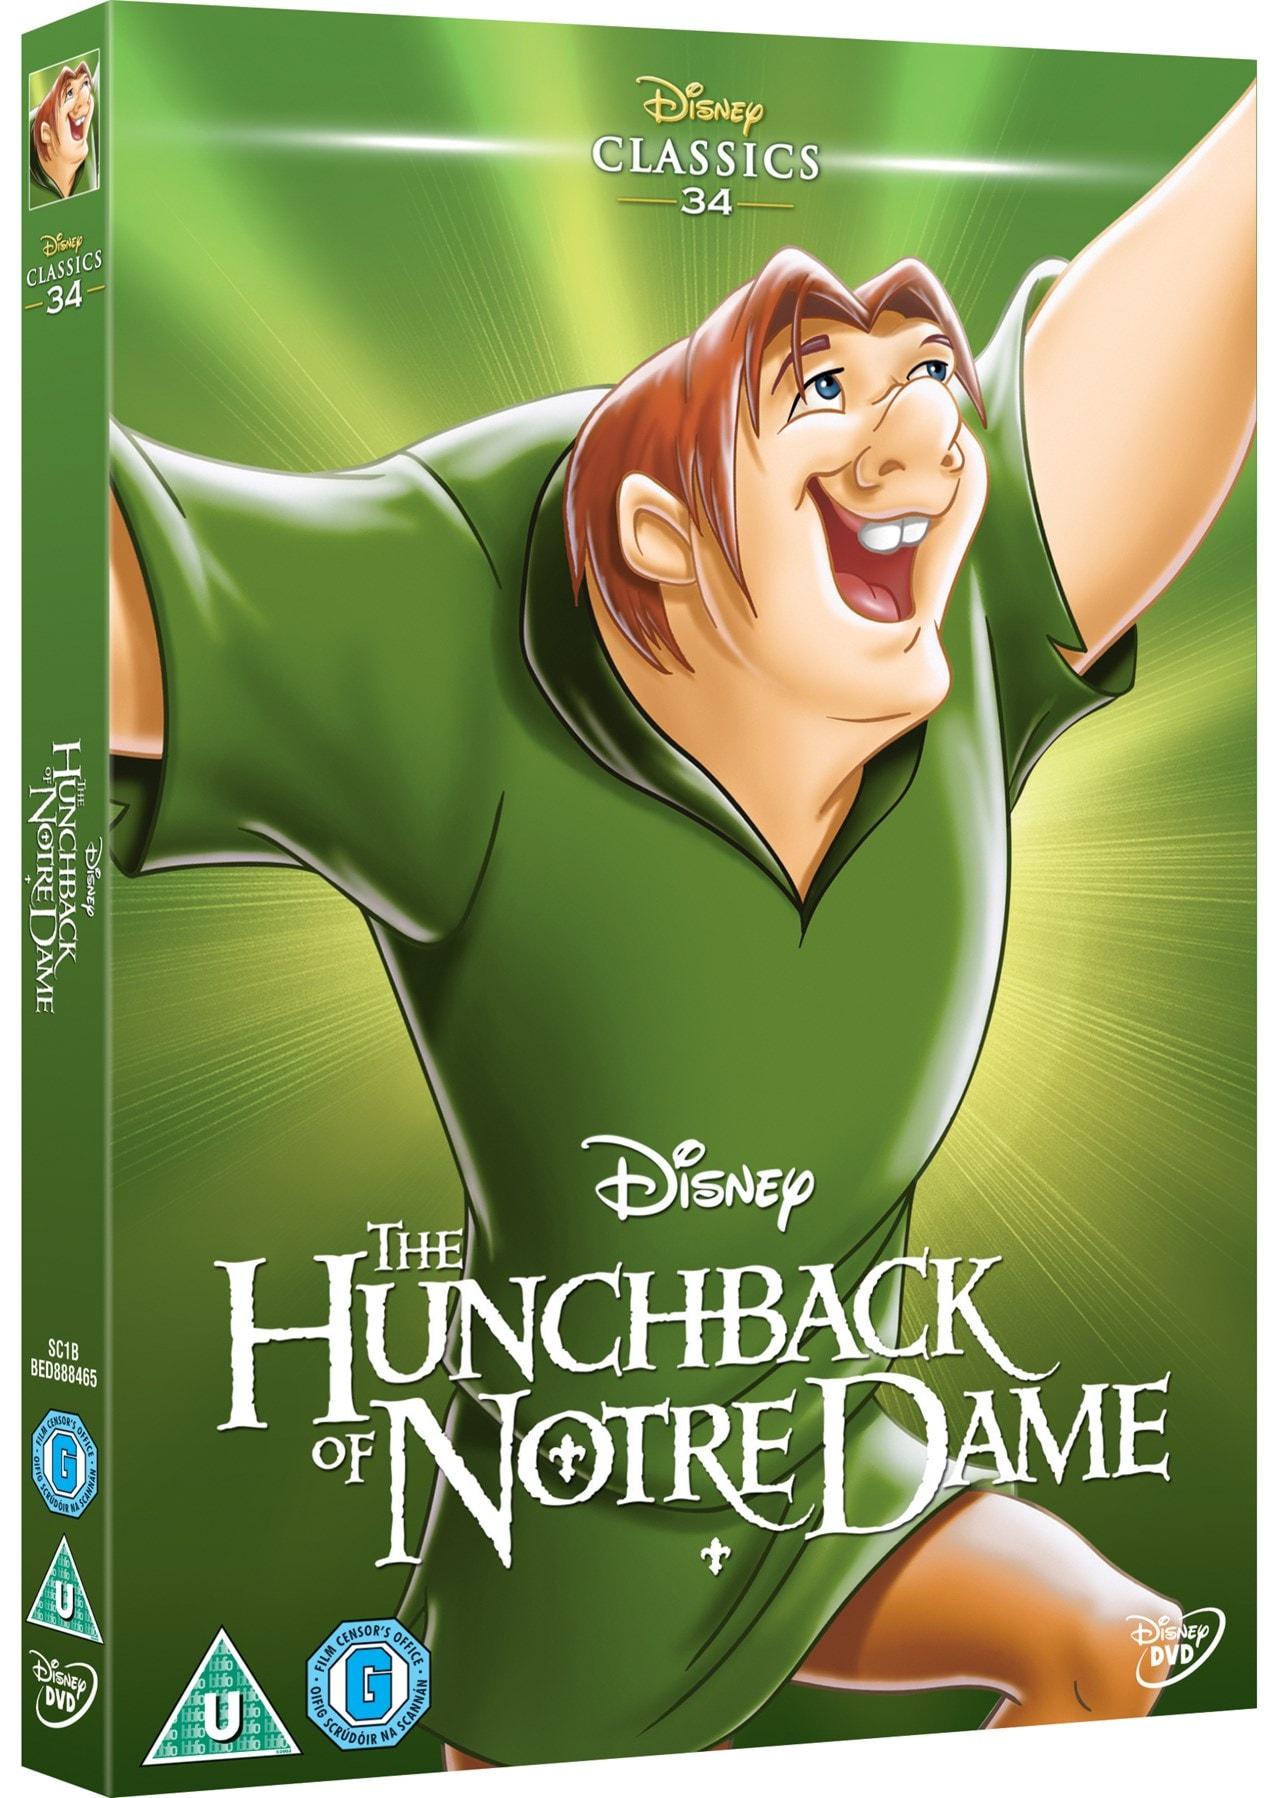 The Hunchback of Notre Dame (Disney) - 2